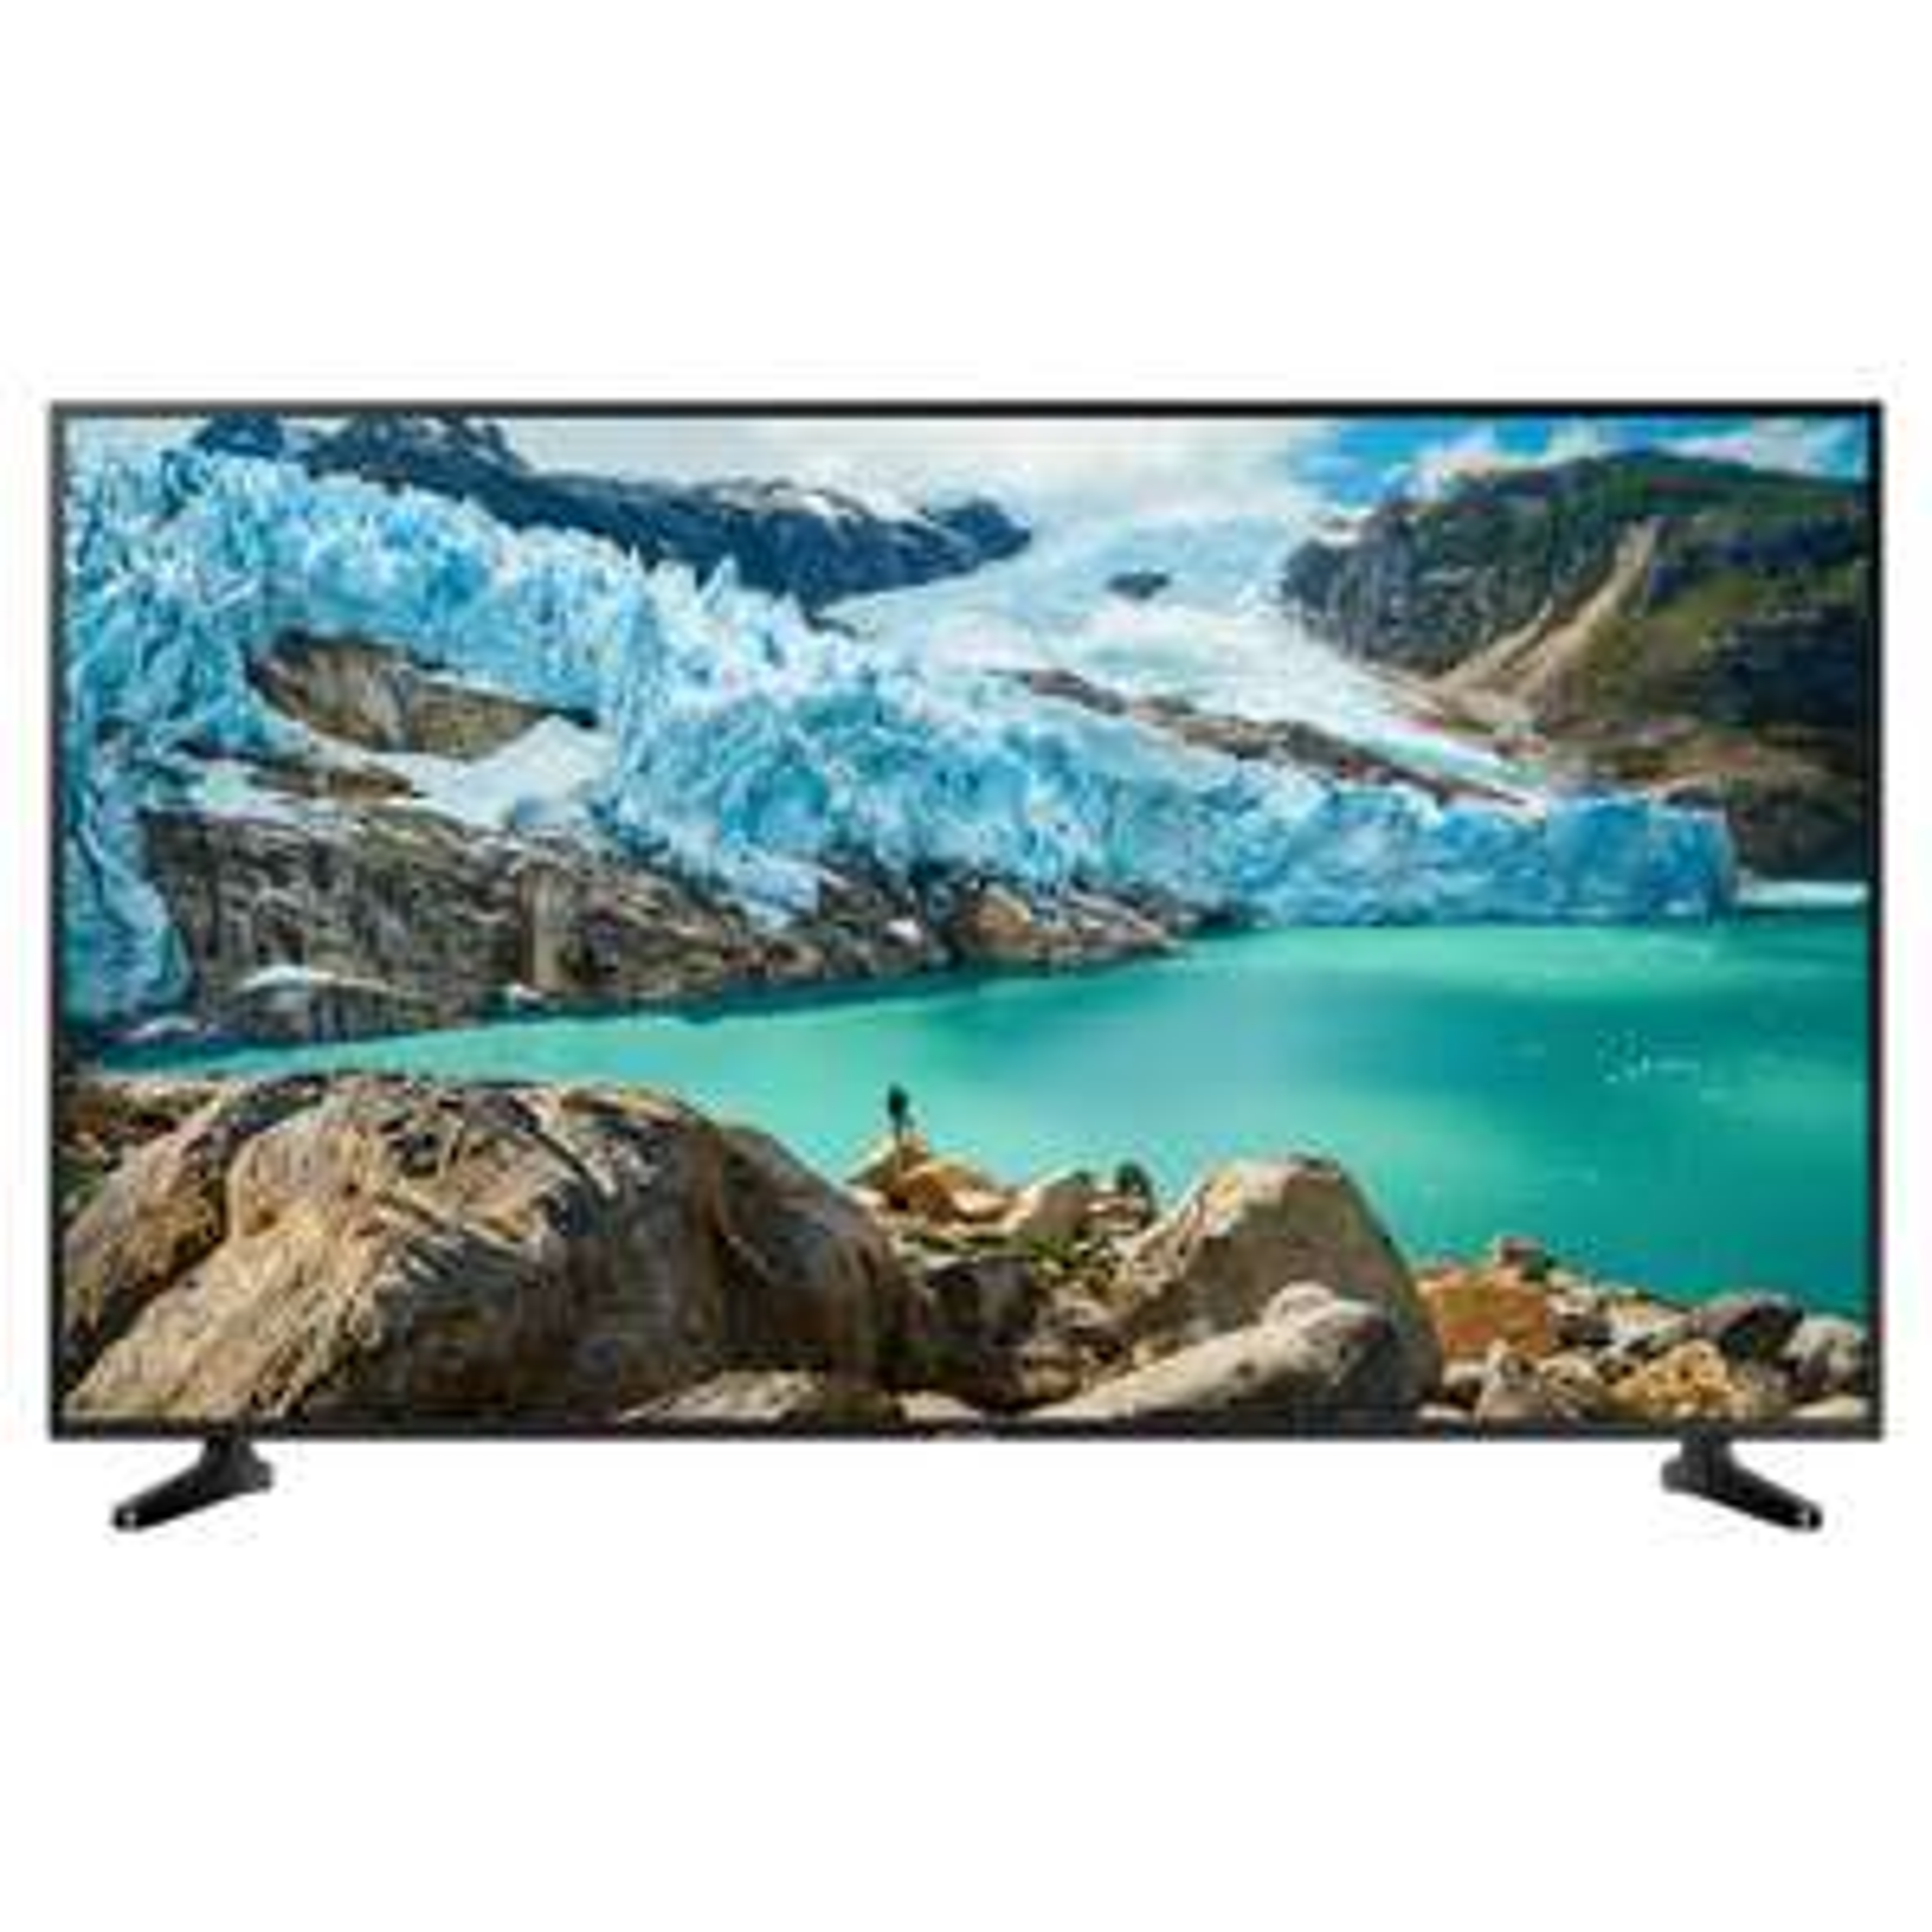 Samsung UE50RU7020 50 HDR 4K Smart TV with Apple TV (2019 model) £314 @ Hughes/ebay with code